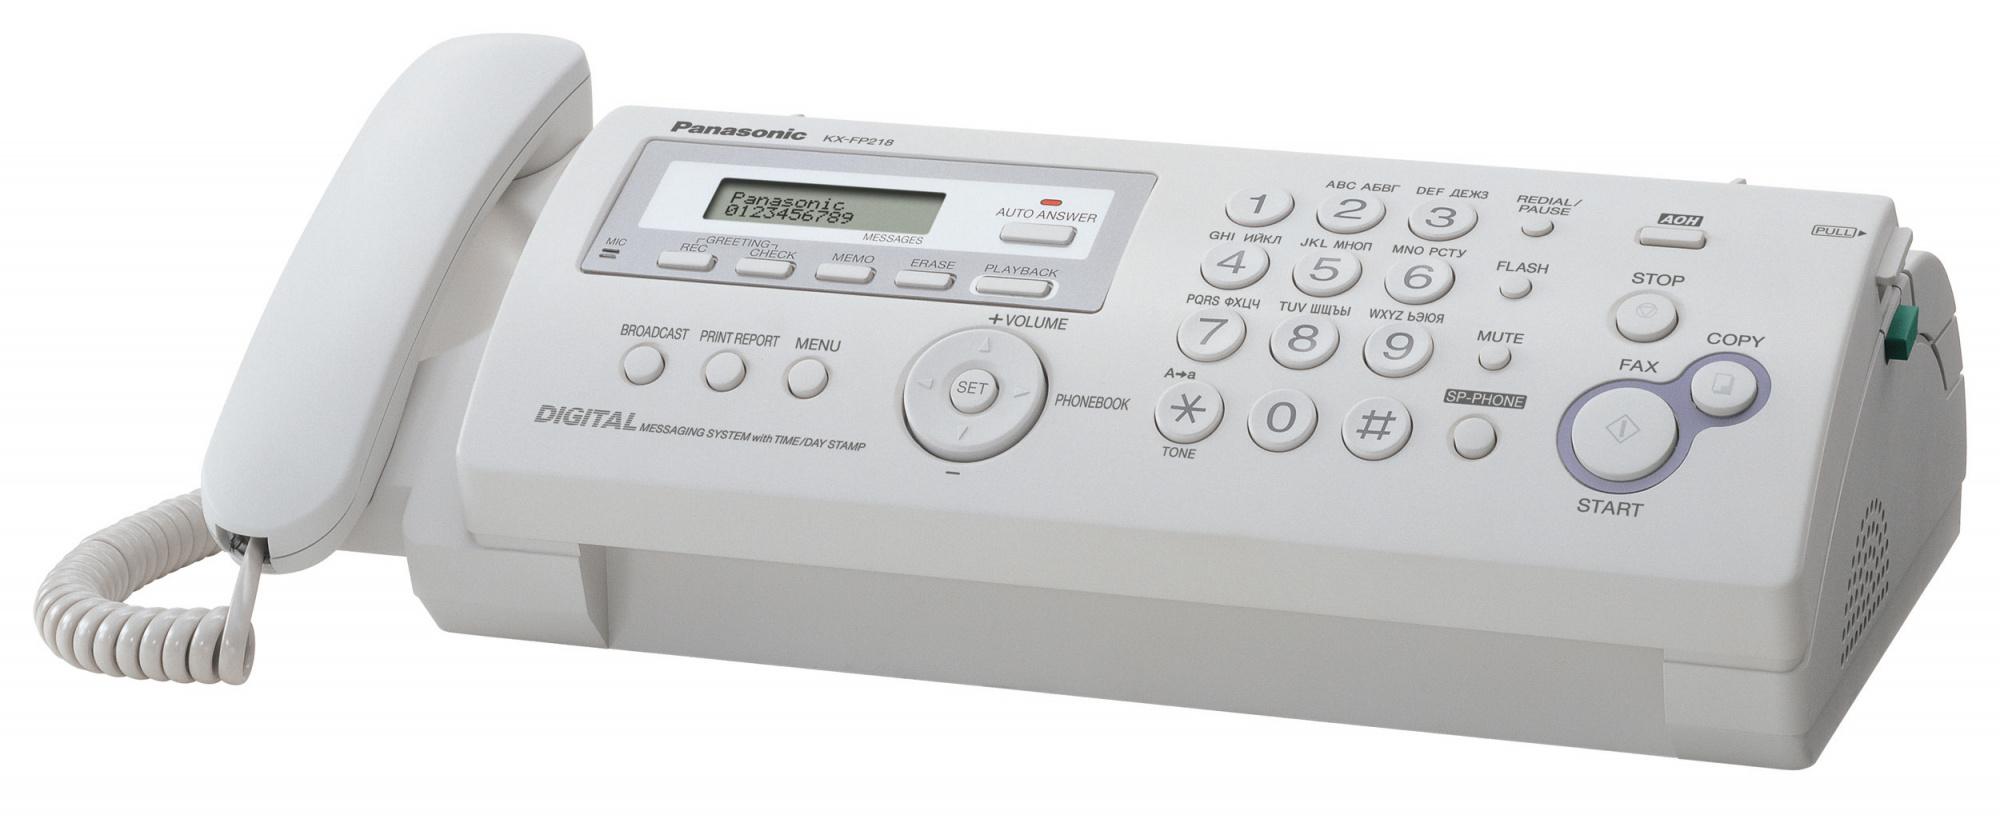 Panasonic KX FP218RU АКЛ00002073